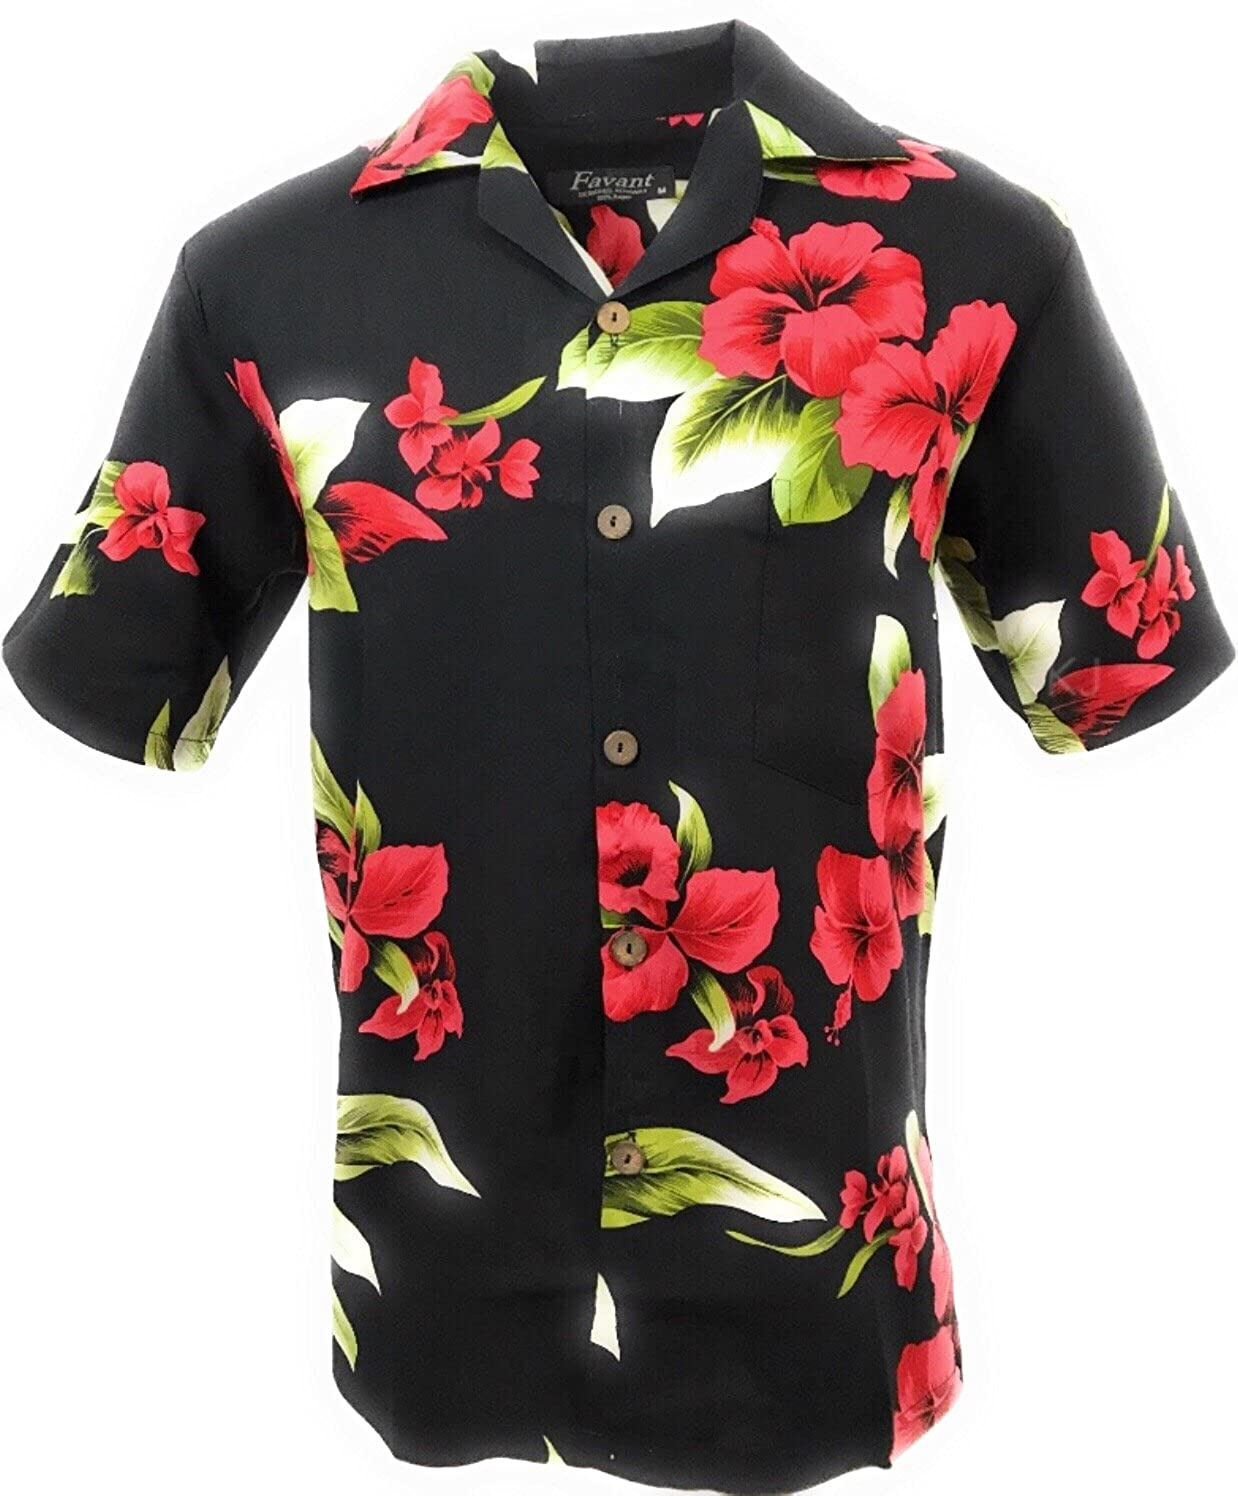 e39aa17e Stylish and Original Hawaiian Aloha Shirt Design looks great everywhere you  go. Lightweight, High Quality Fabric and Loose Fit will keep you cool and  ...